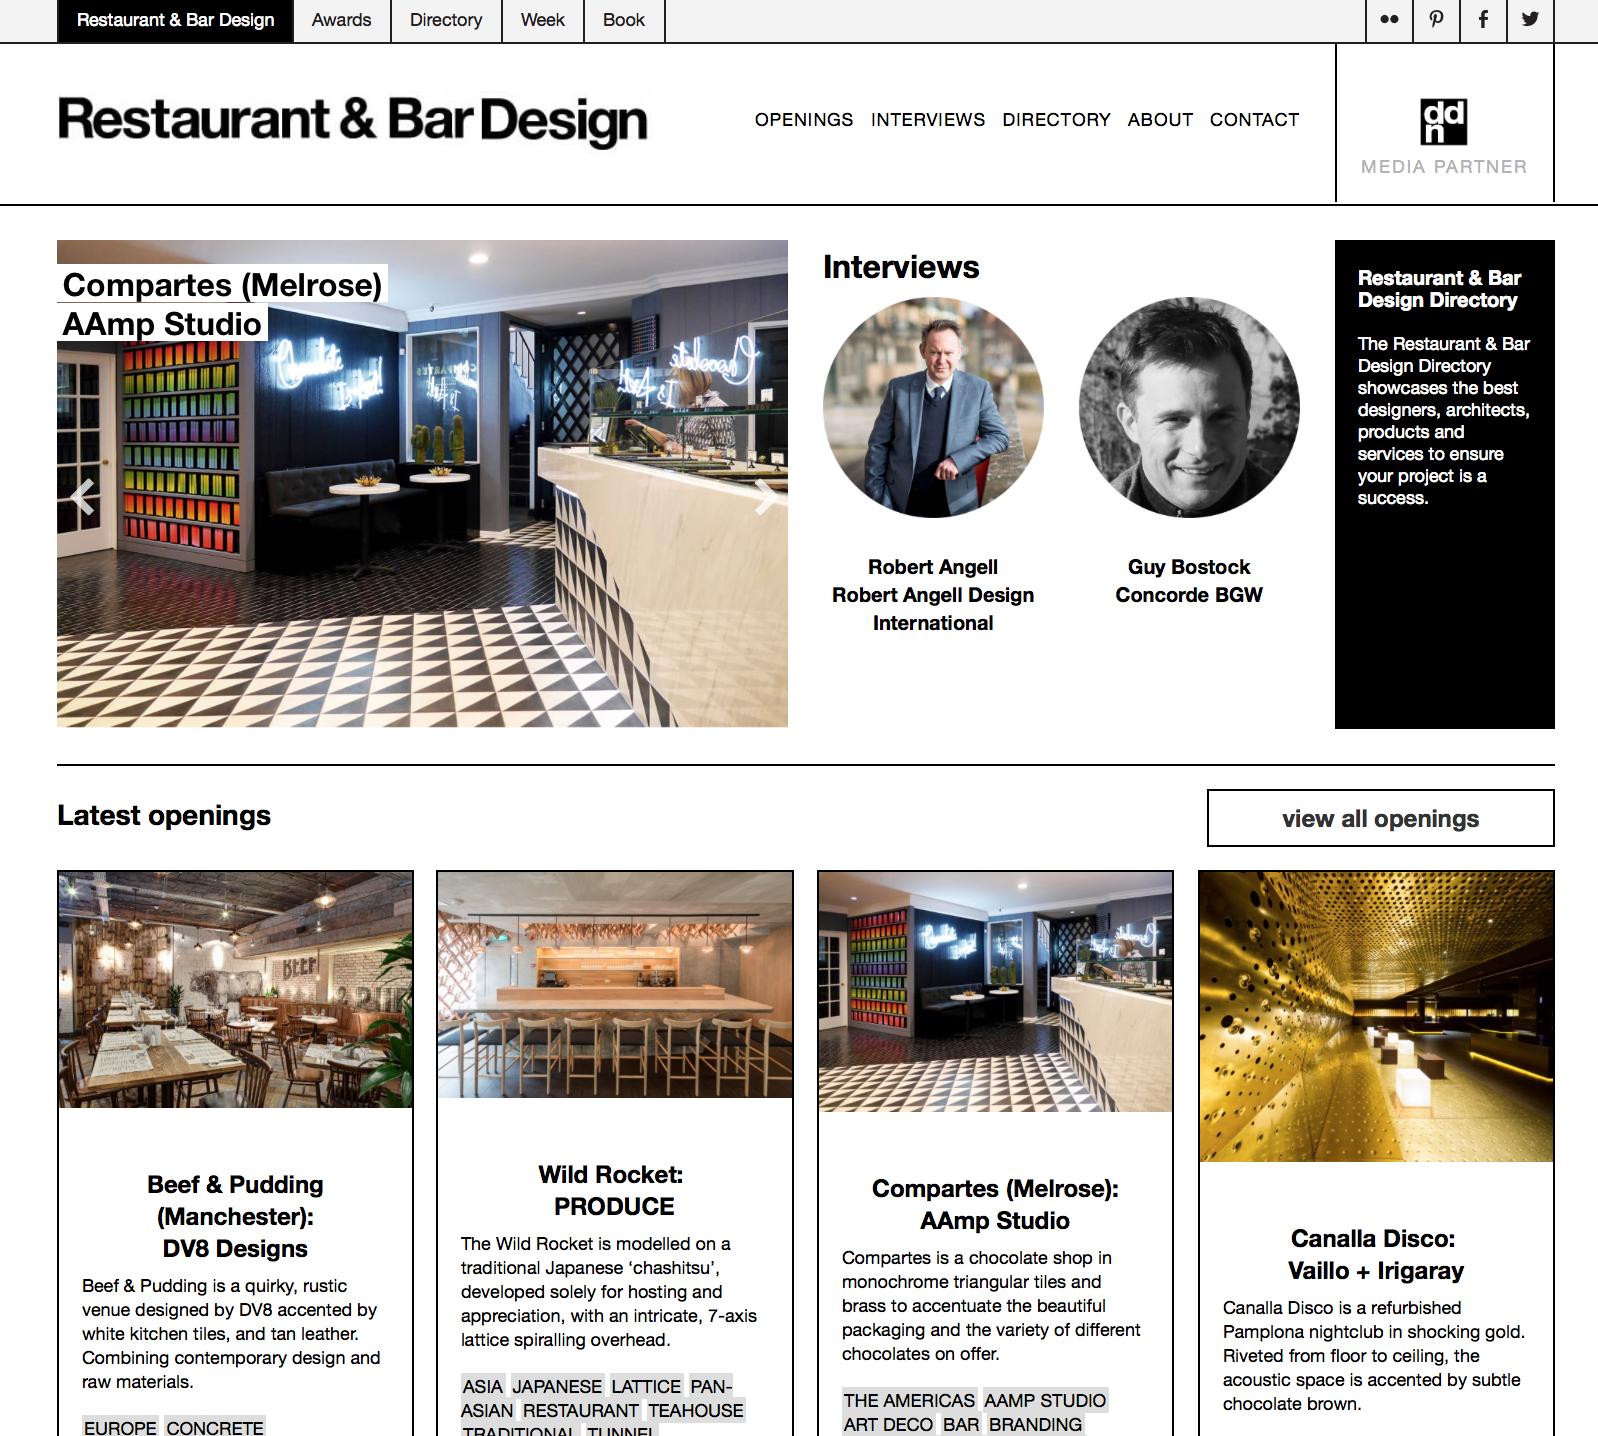 http://restaurantandbardesign.com/2015/04/08/compartes-melrose-aamp-studio/